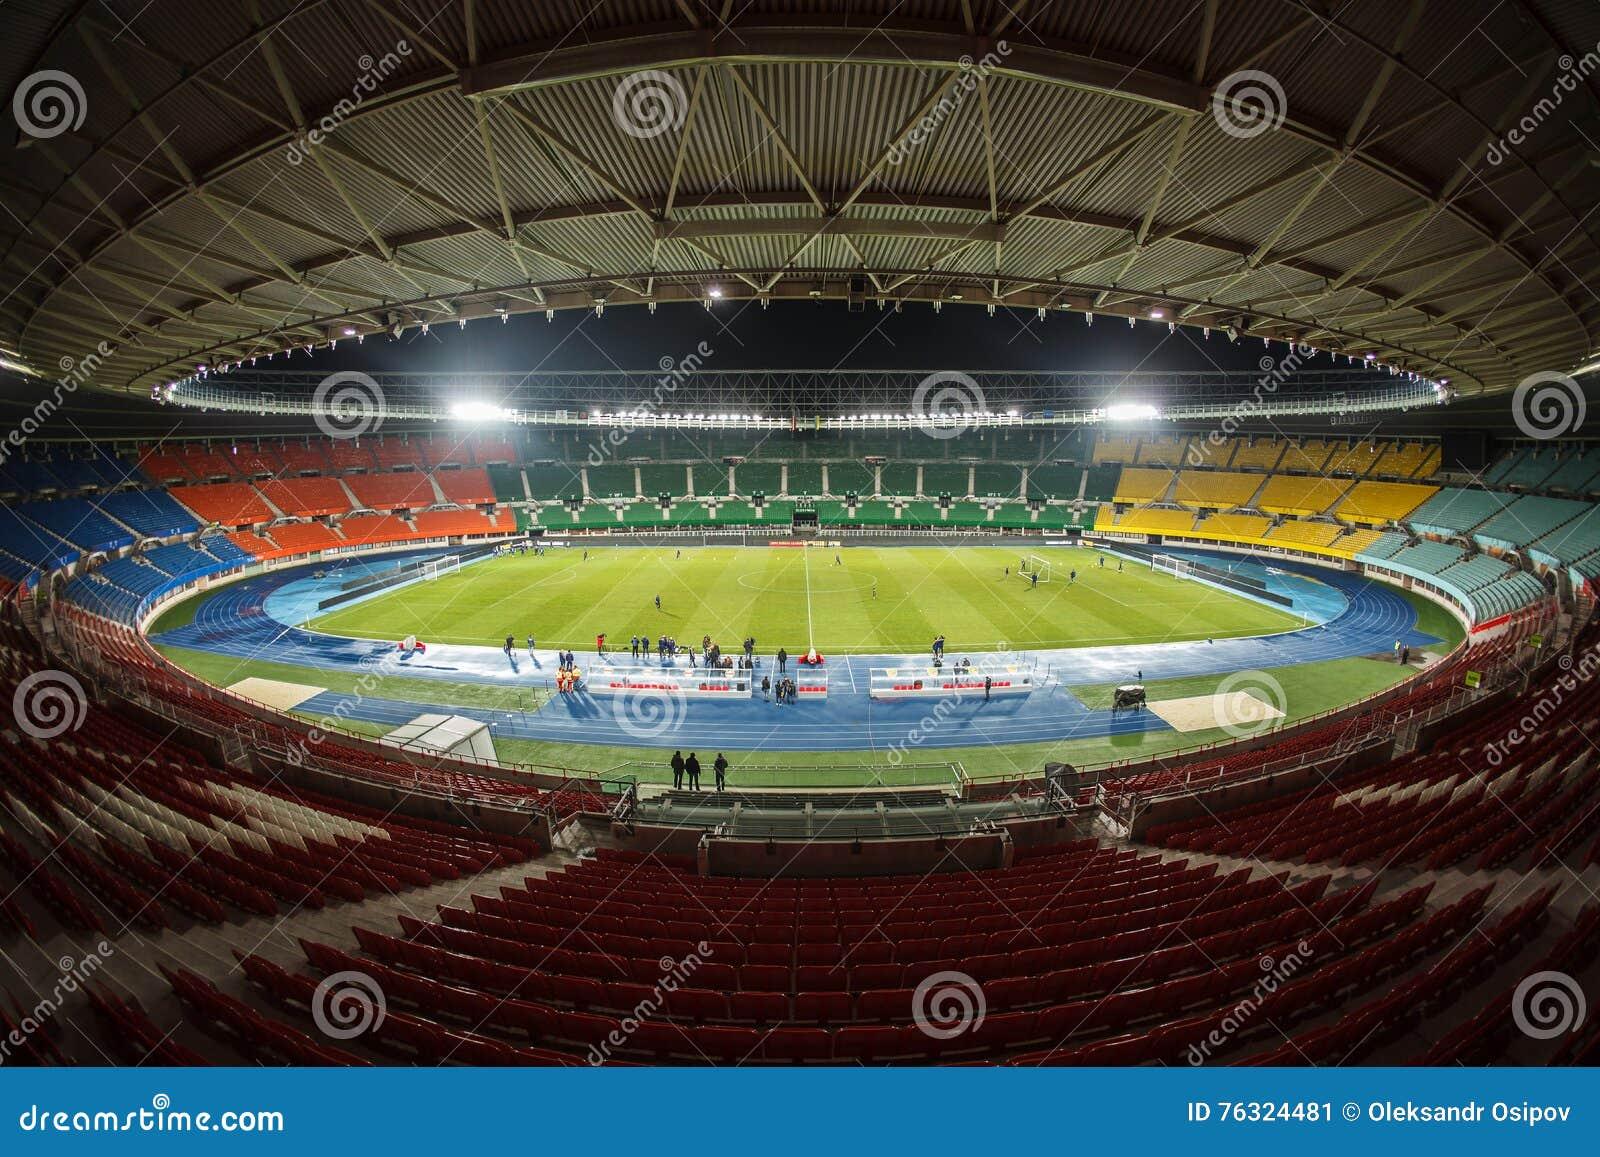 Ernst Happel Stadion Editorial Photo Image Of Match 76324481